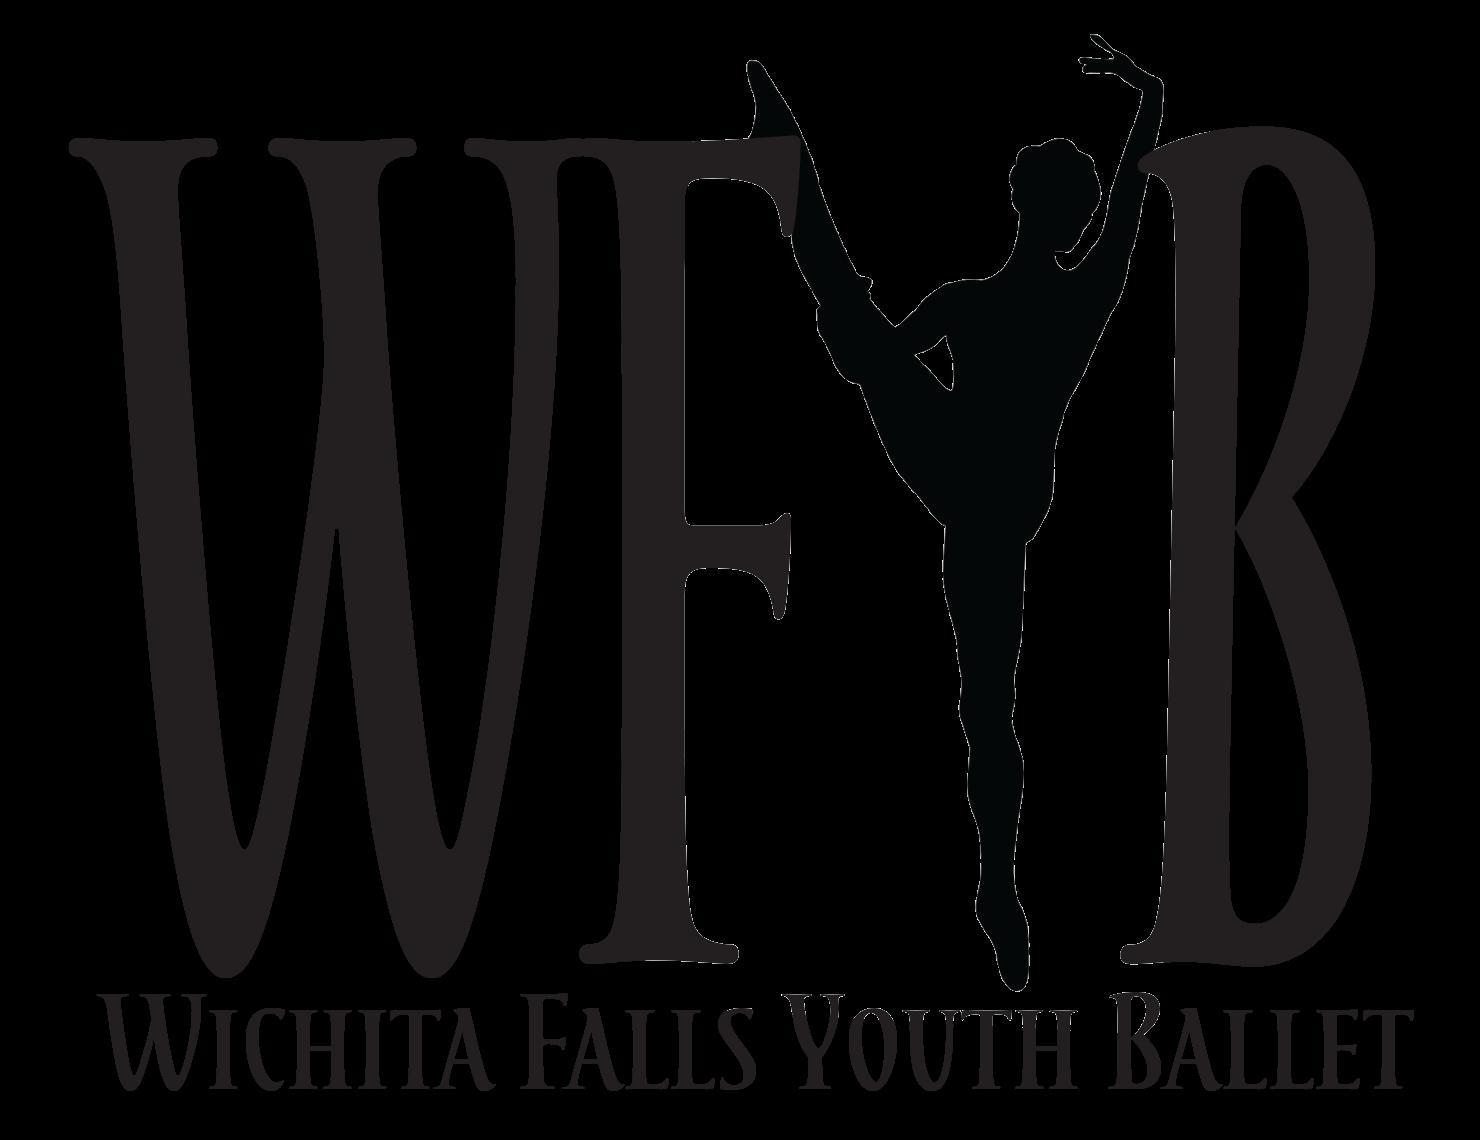 Craigslist Wichita Falls Tx - petfinder